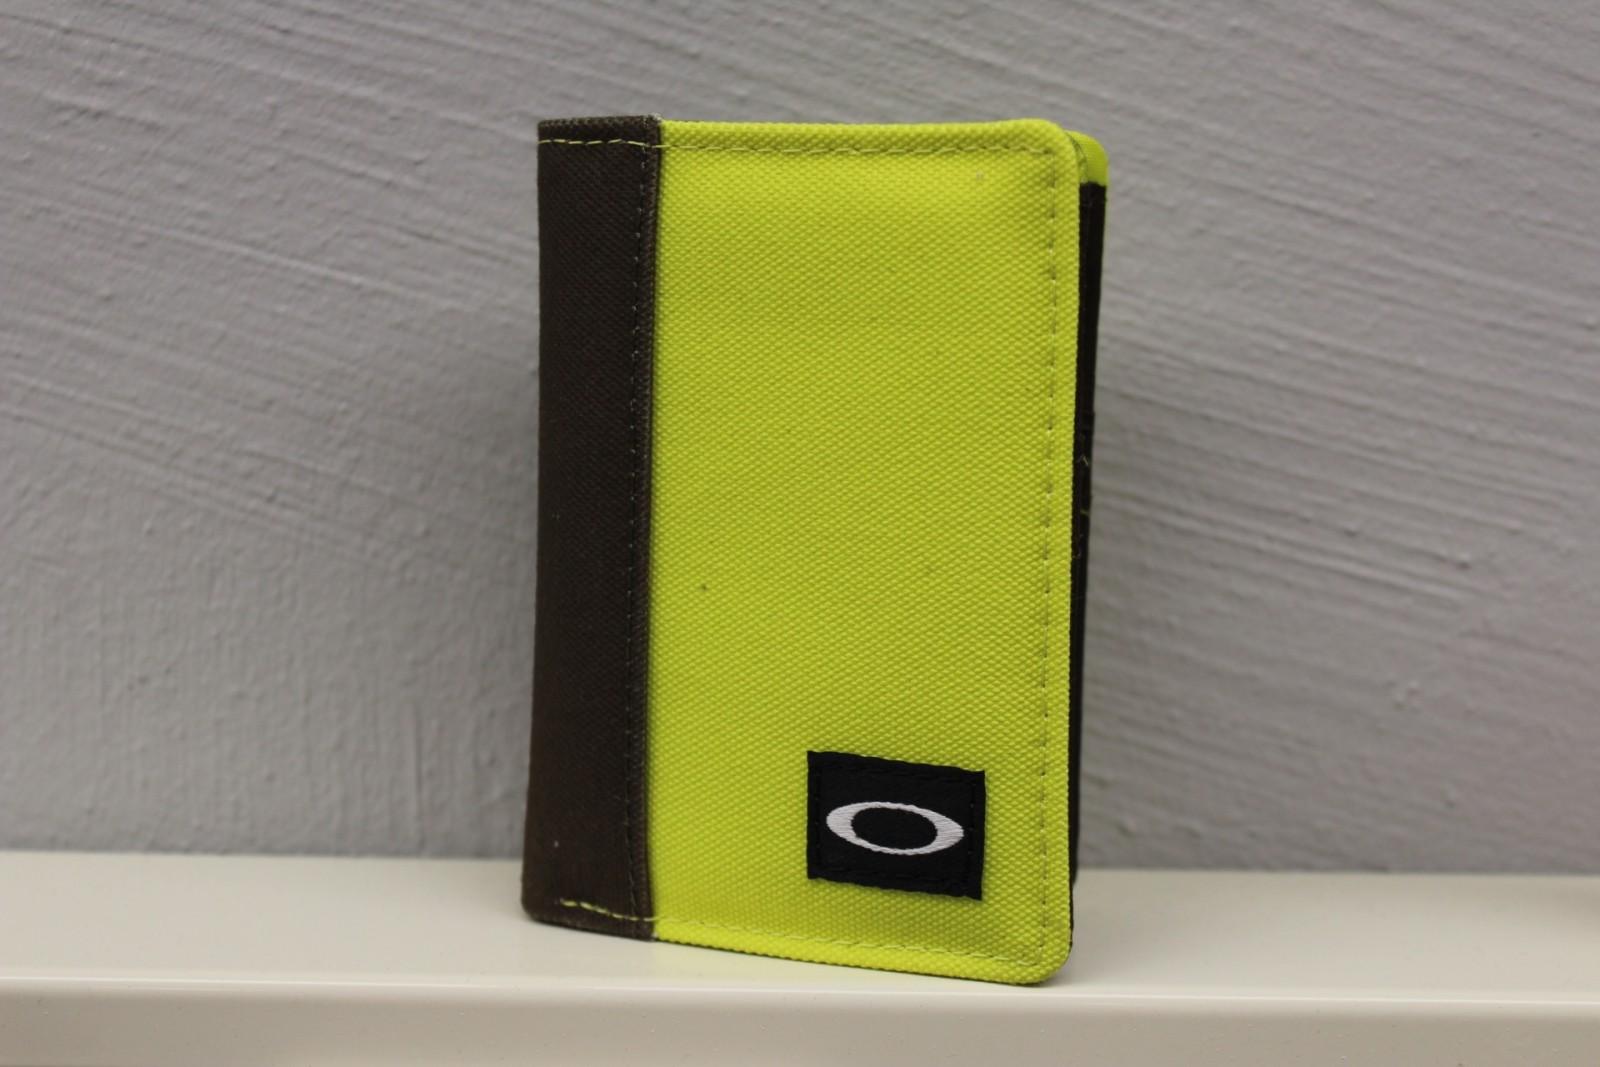 Webshop Portemonnee.Oakley Lock Box Wallet Canteen 95144 87y Portemonnee Shop For